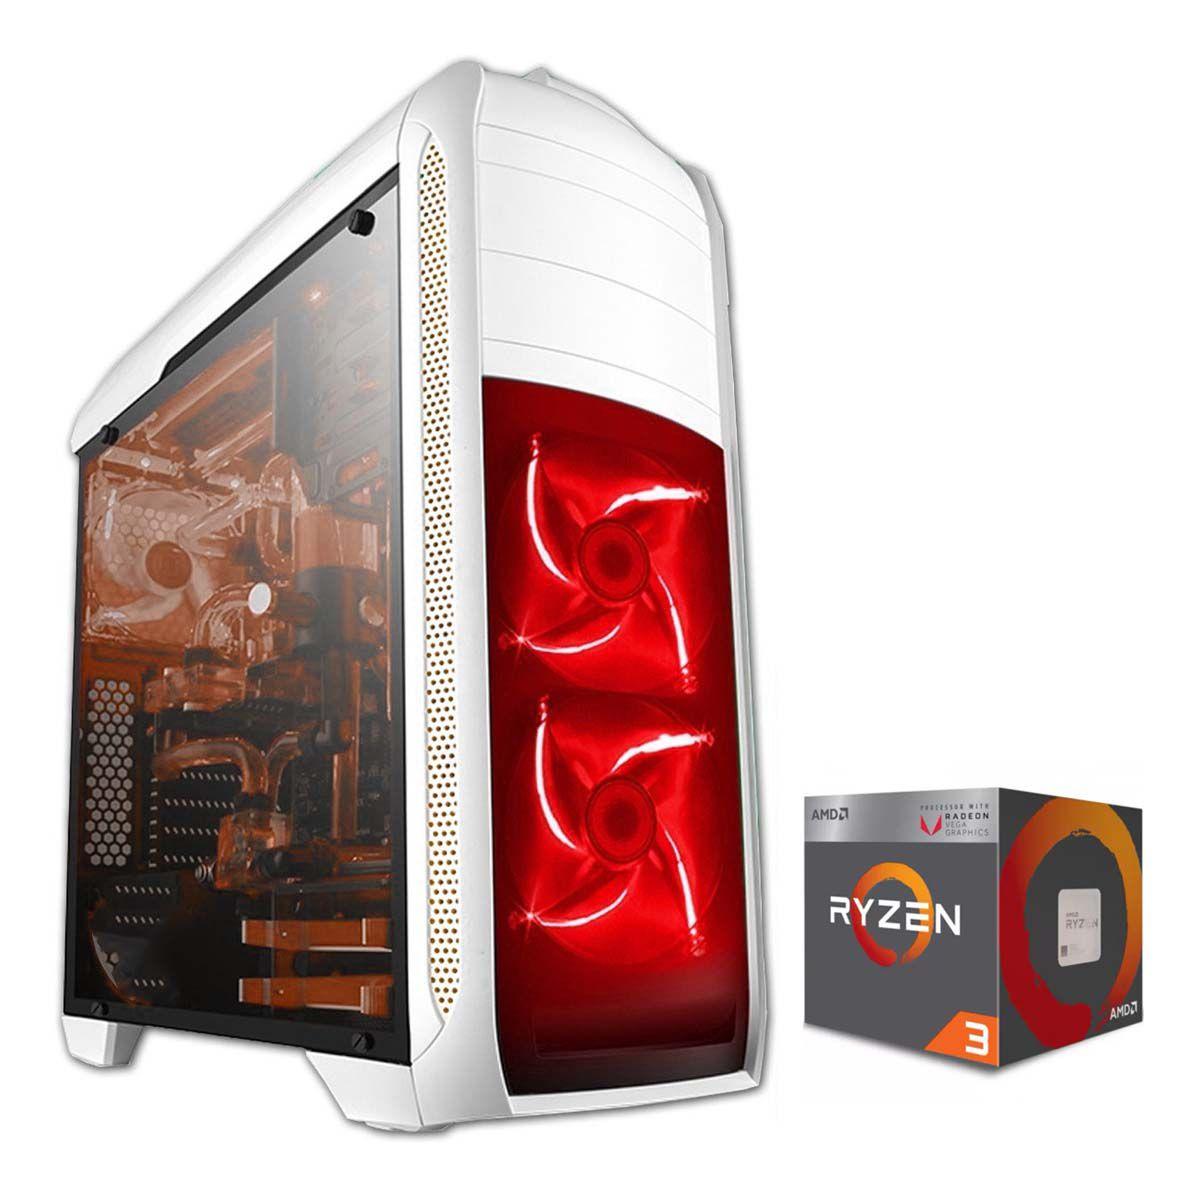 Pc Gamer Ryzen 3 2200g - RX 550 4gb - 8gb Ram - SSD 120Gb - 500W